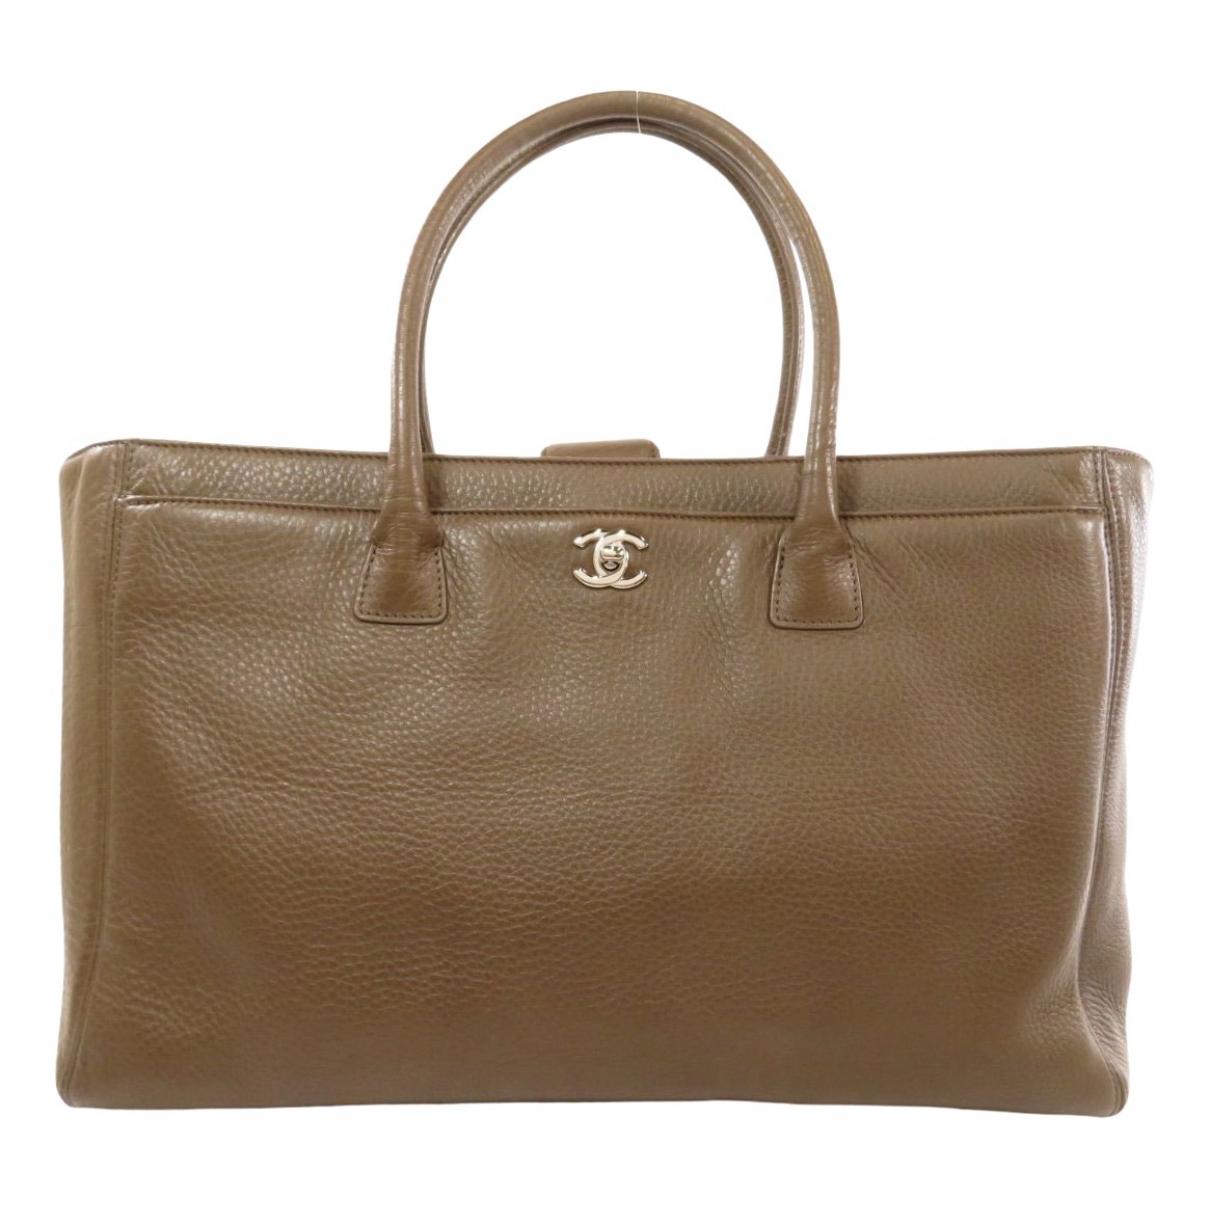 Chanel Executive Brown Leather handbag for Women \N